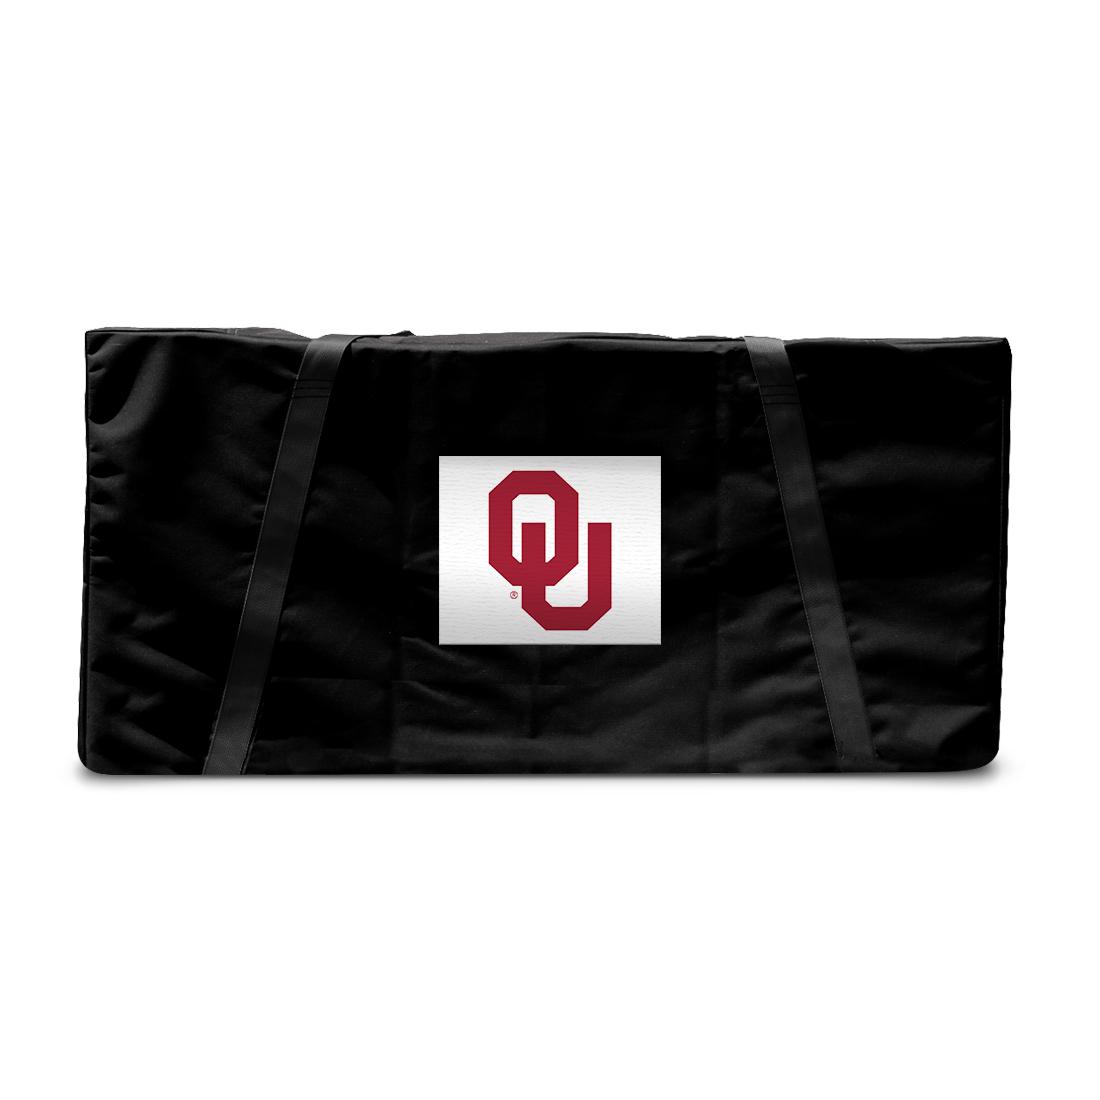 Oklahoma OU Sooners Tailgate Cornhole Storage Carrying Case